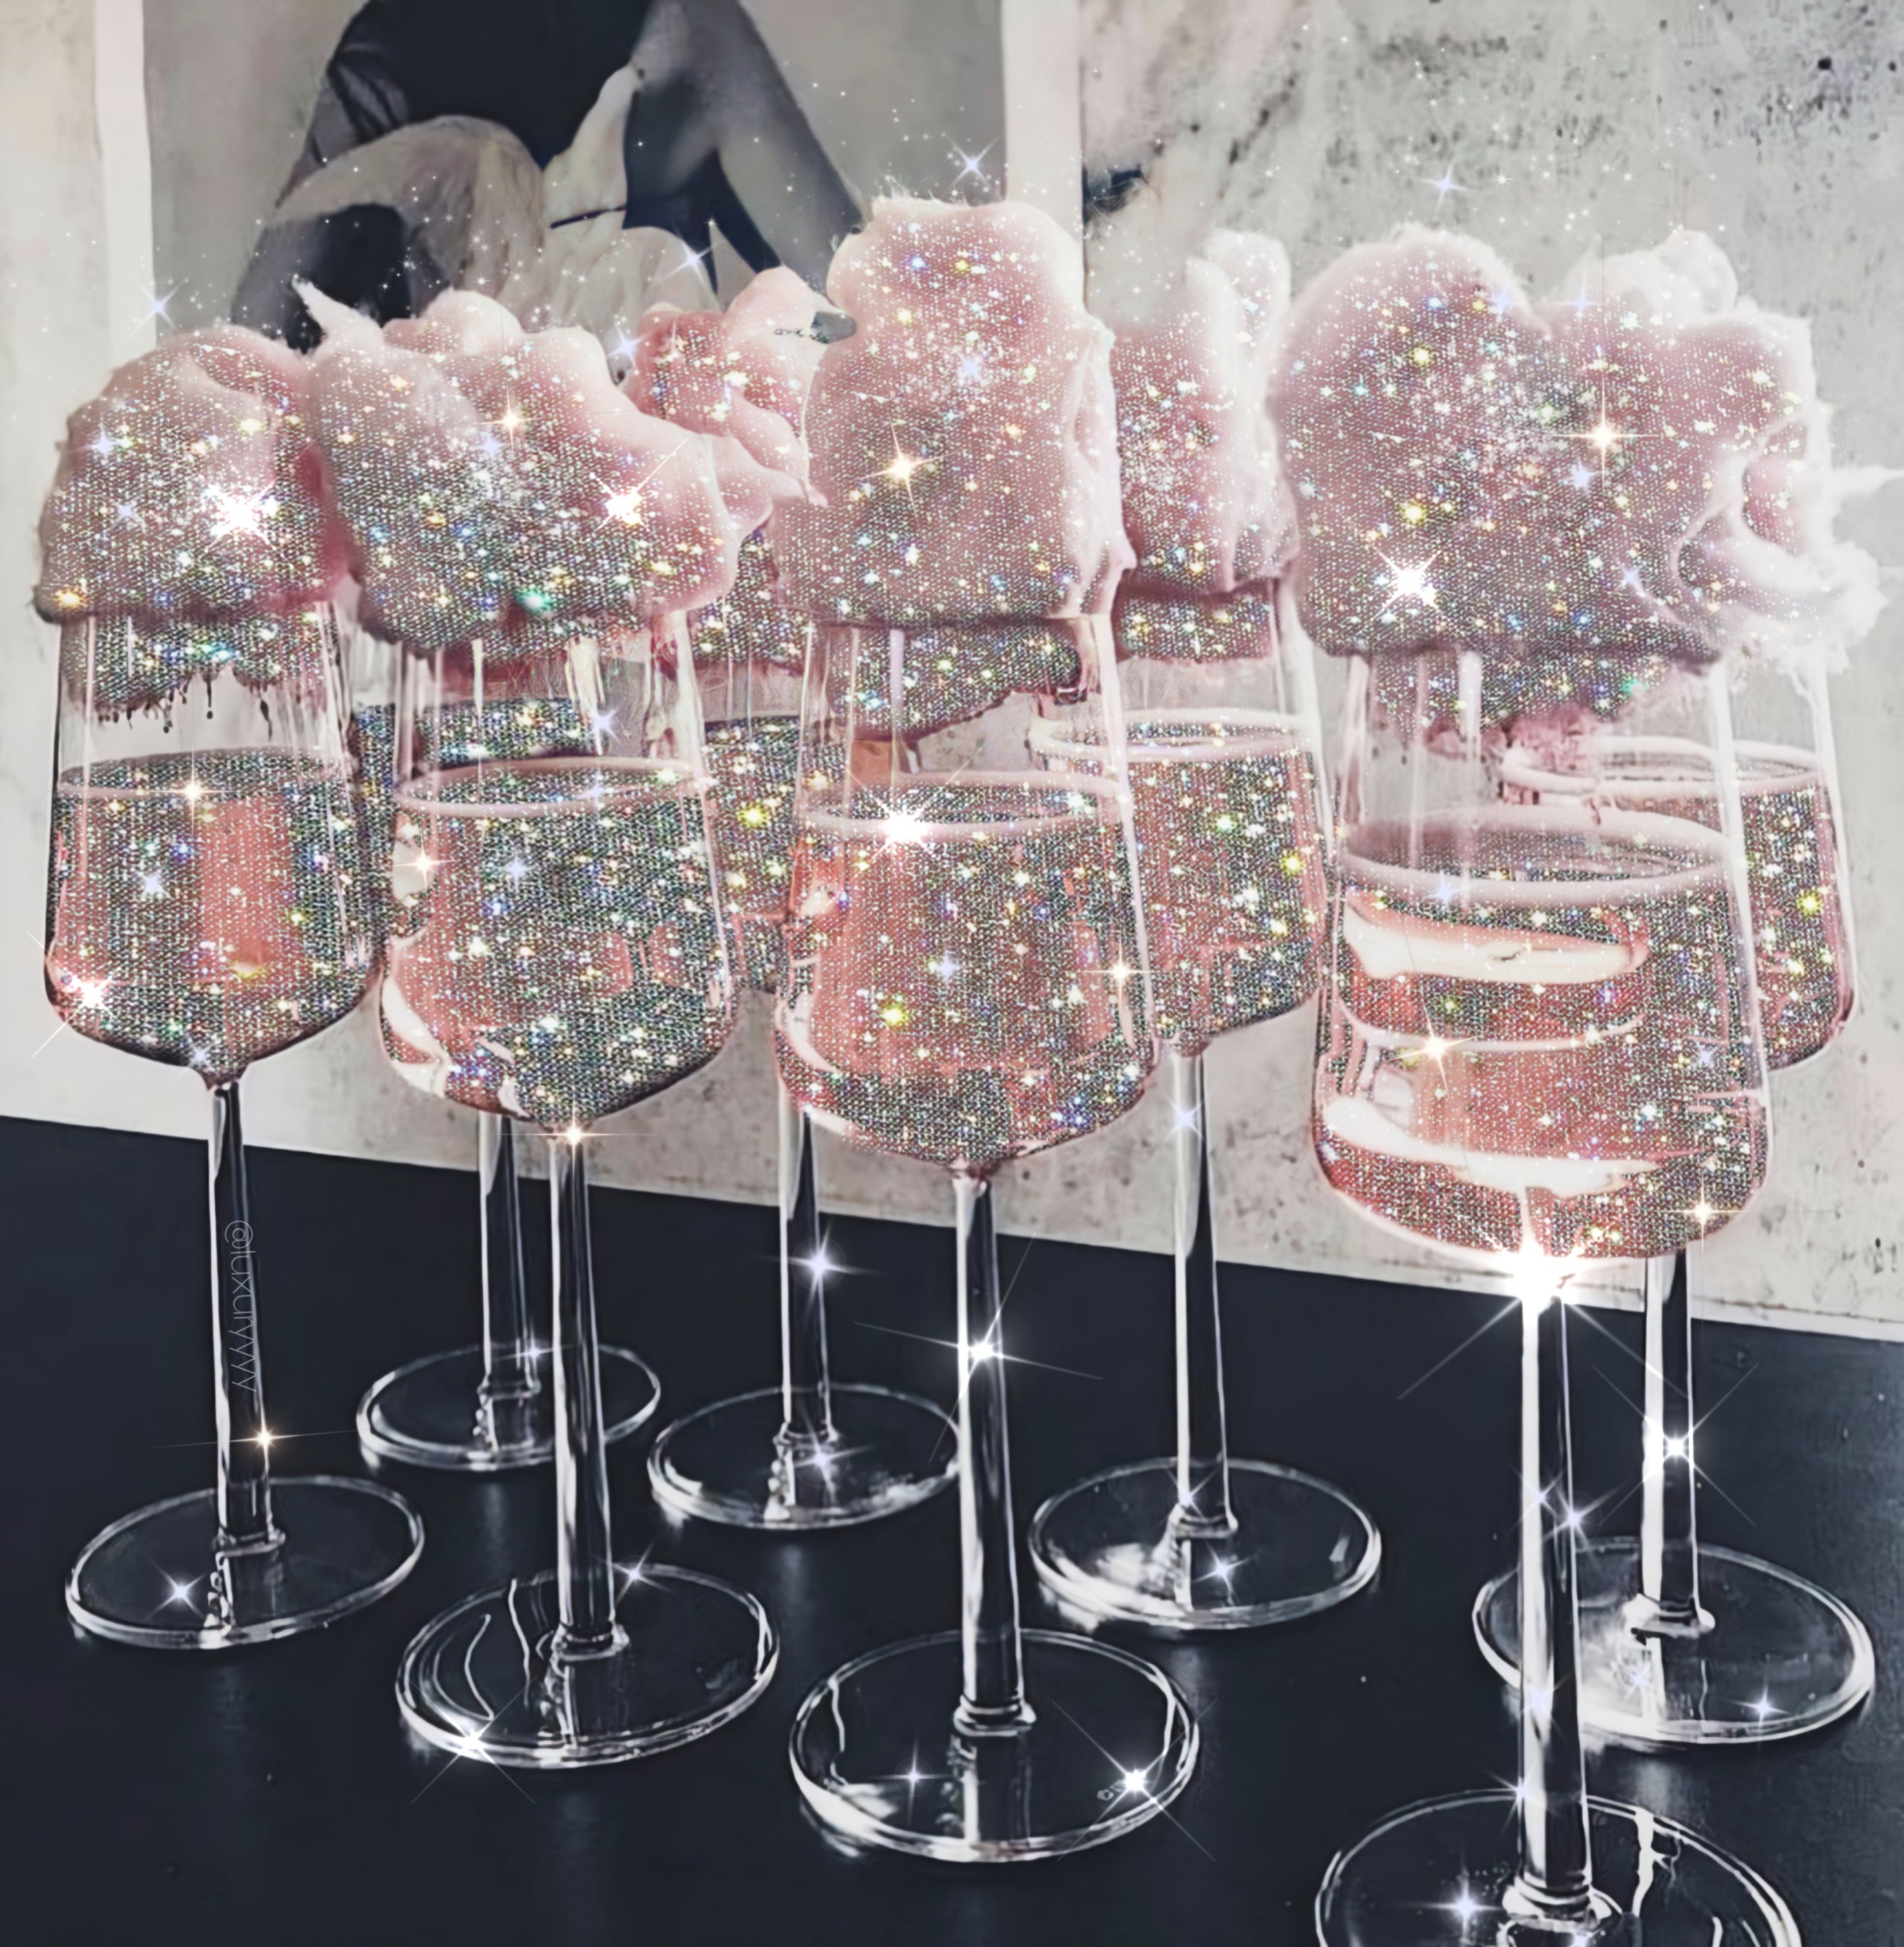 Glitter art by @alteregoss (luxuryyyy is my insta name)#glitter #glittery #glitters #aesthetic #sparkle #shine #glow #glowing #silver #overlay #drinks #pi